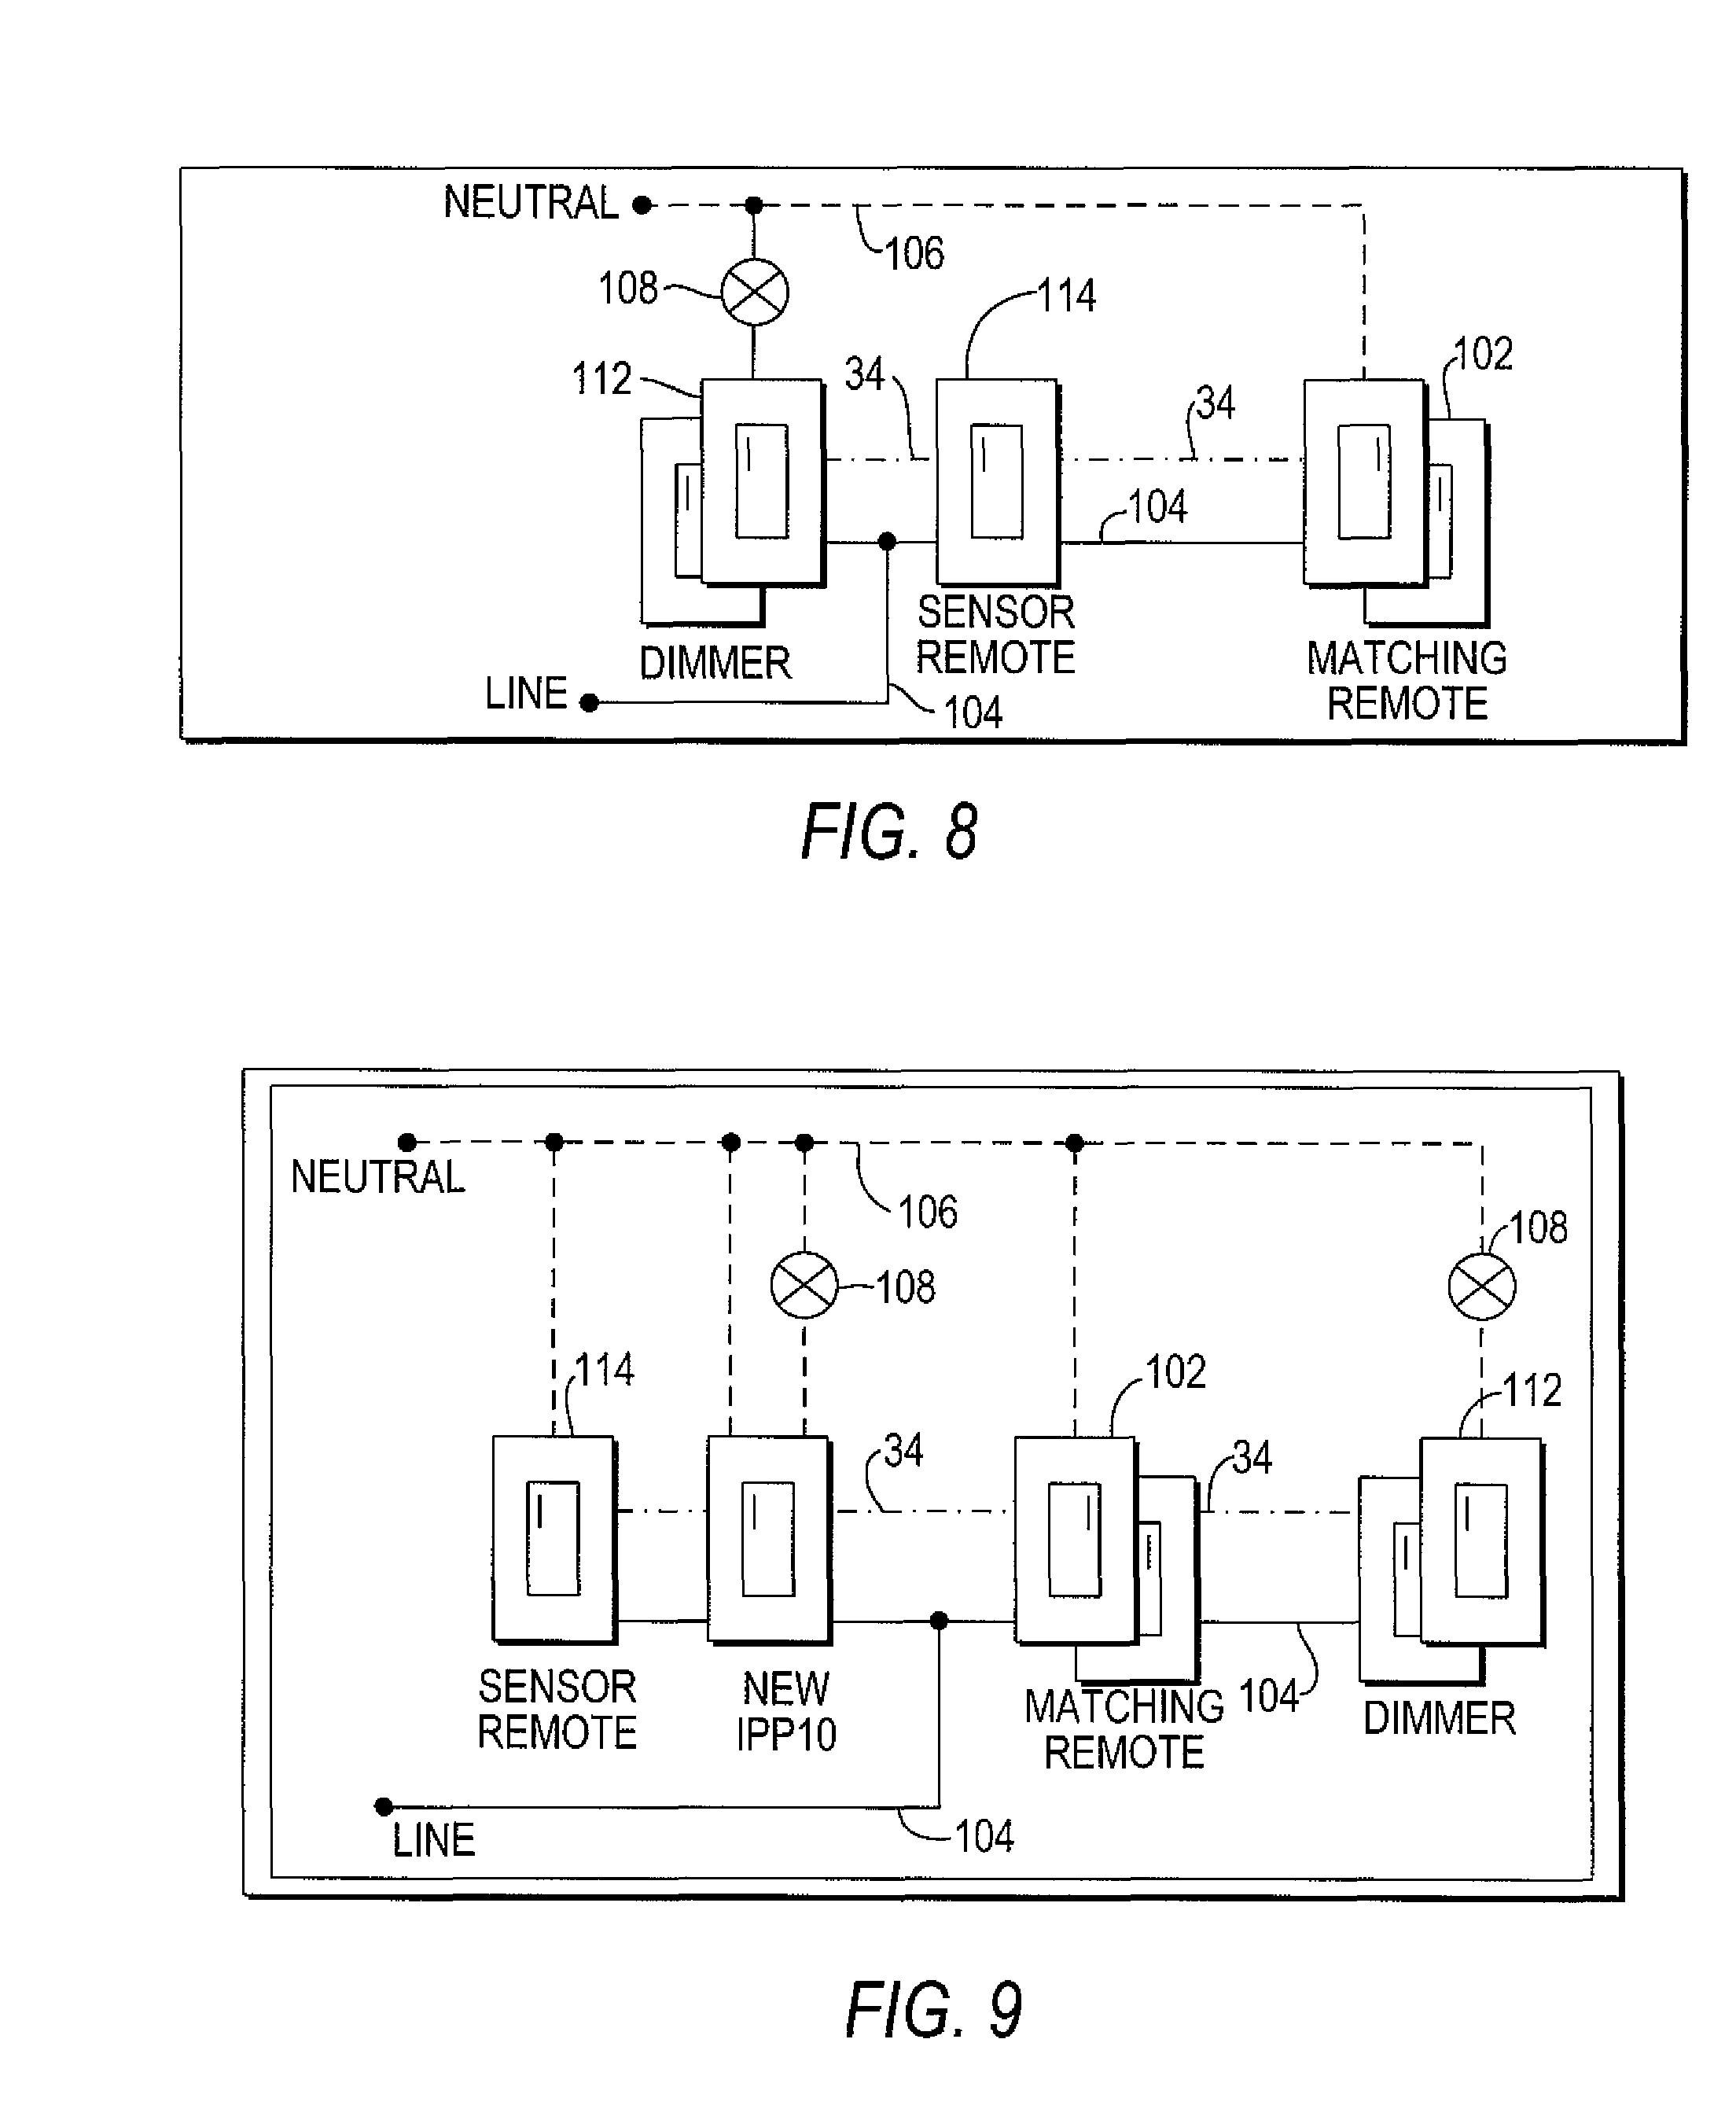 3 way motion sensor switch wiring diagram Collection-Patent Us Motion Sensor Switch for 3 Way Light Circuit New Patent Us Motion Sensor 18-s